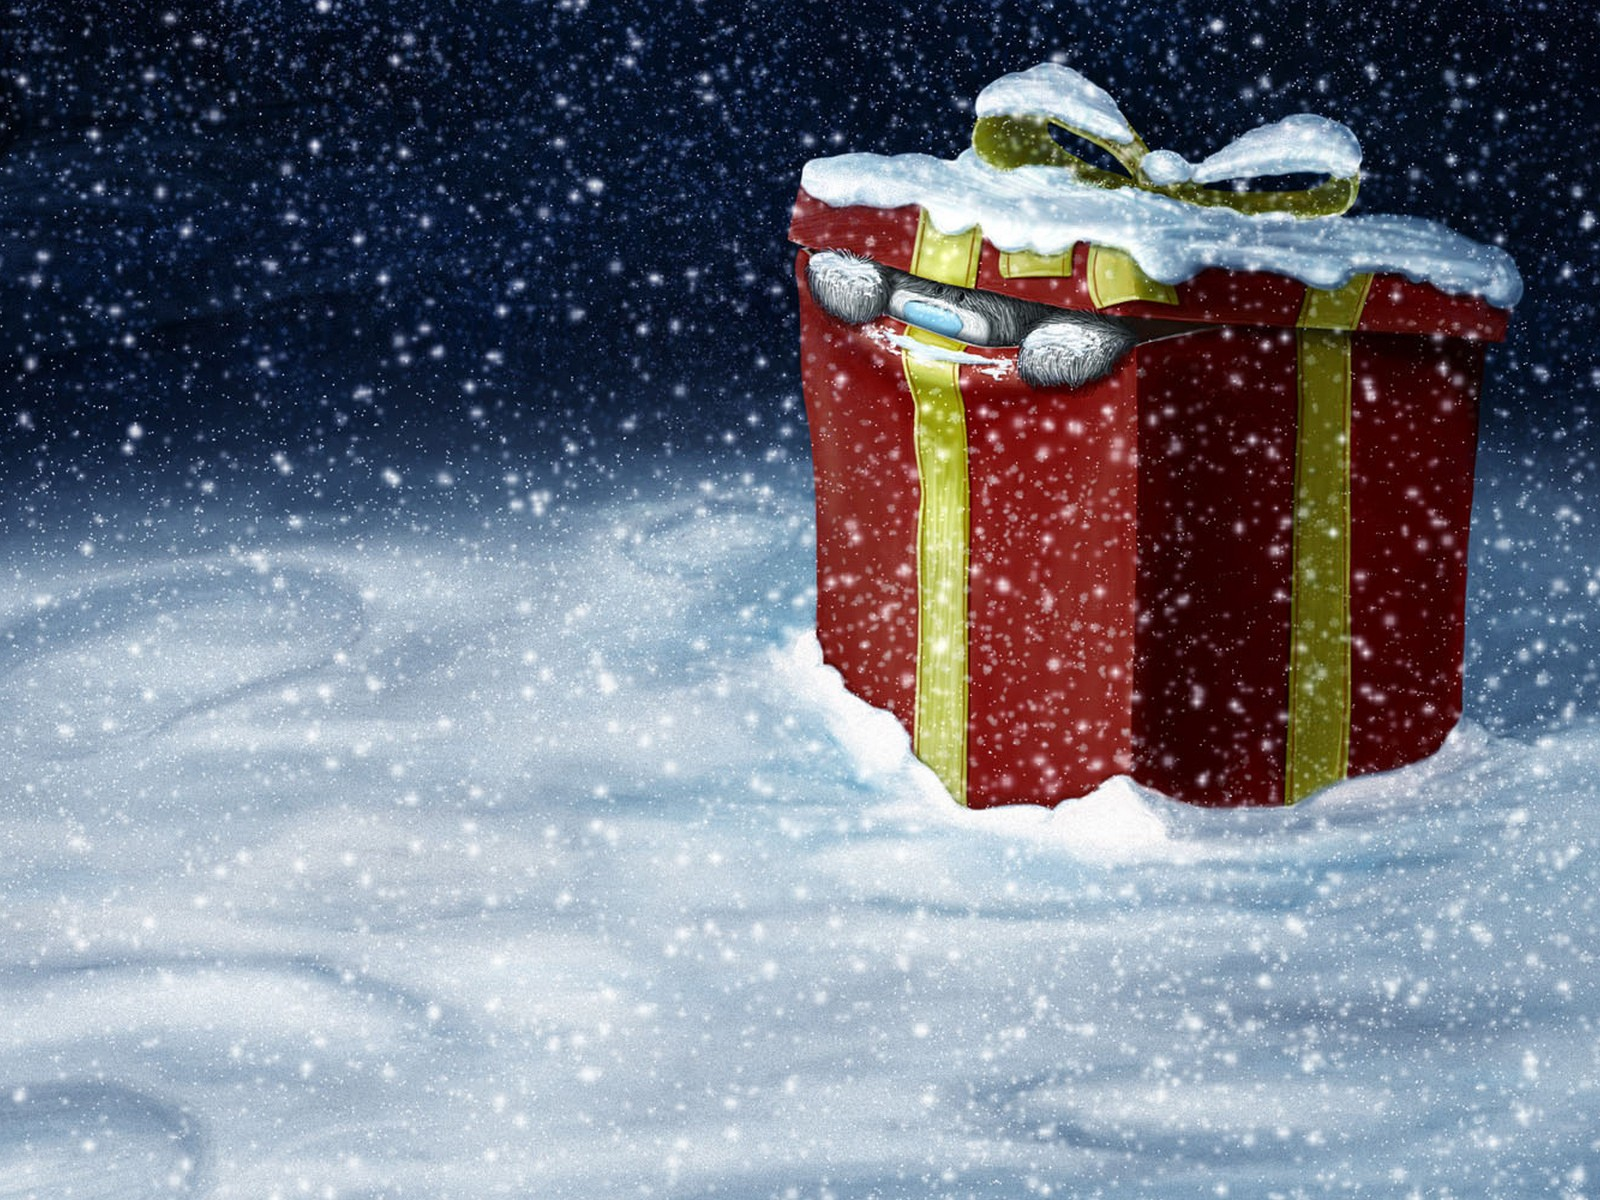 holiday wallpaper christmas winter snow gift teddy bear hd 1600x1200